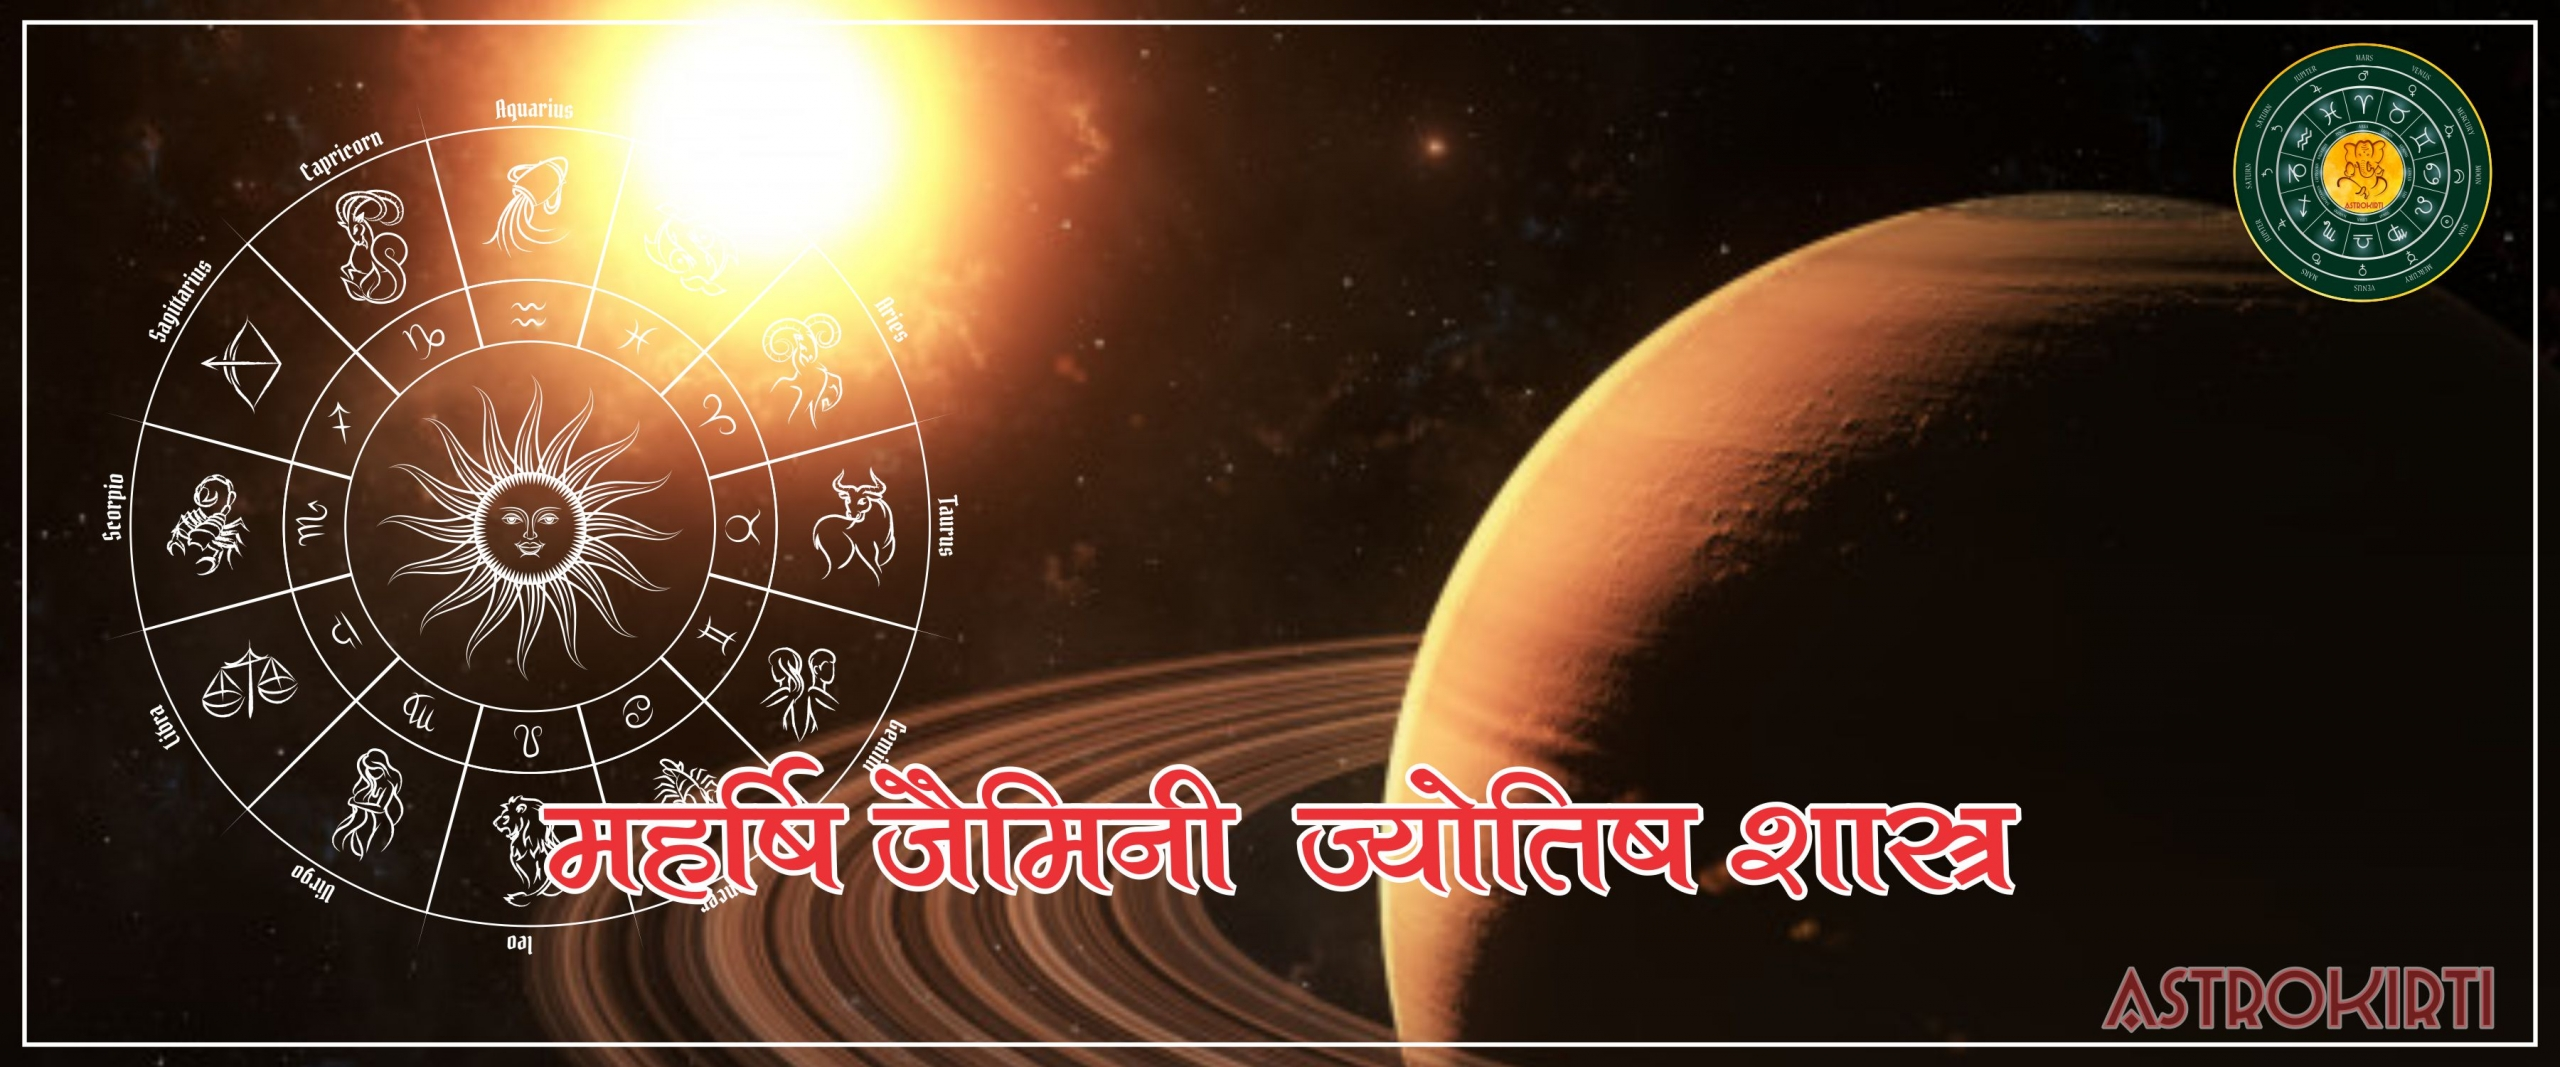 Gemini Astrology